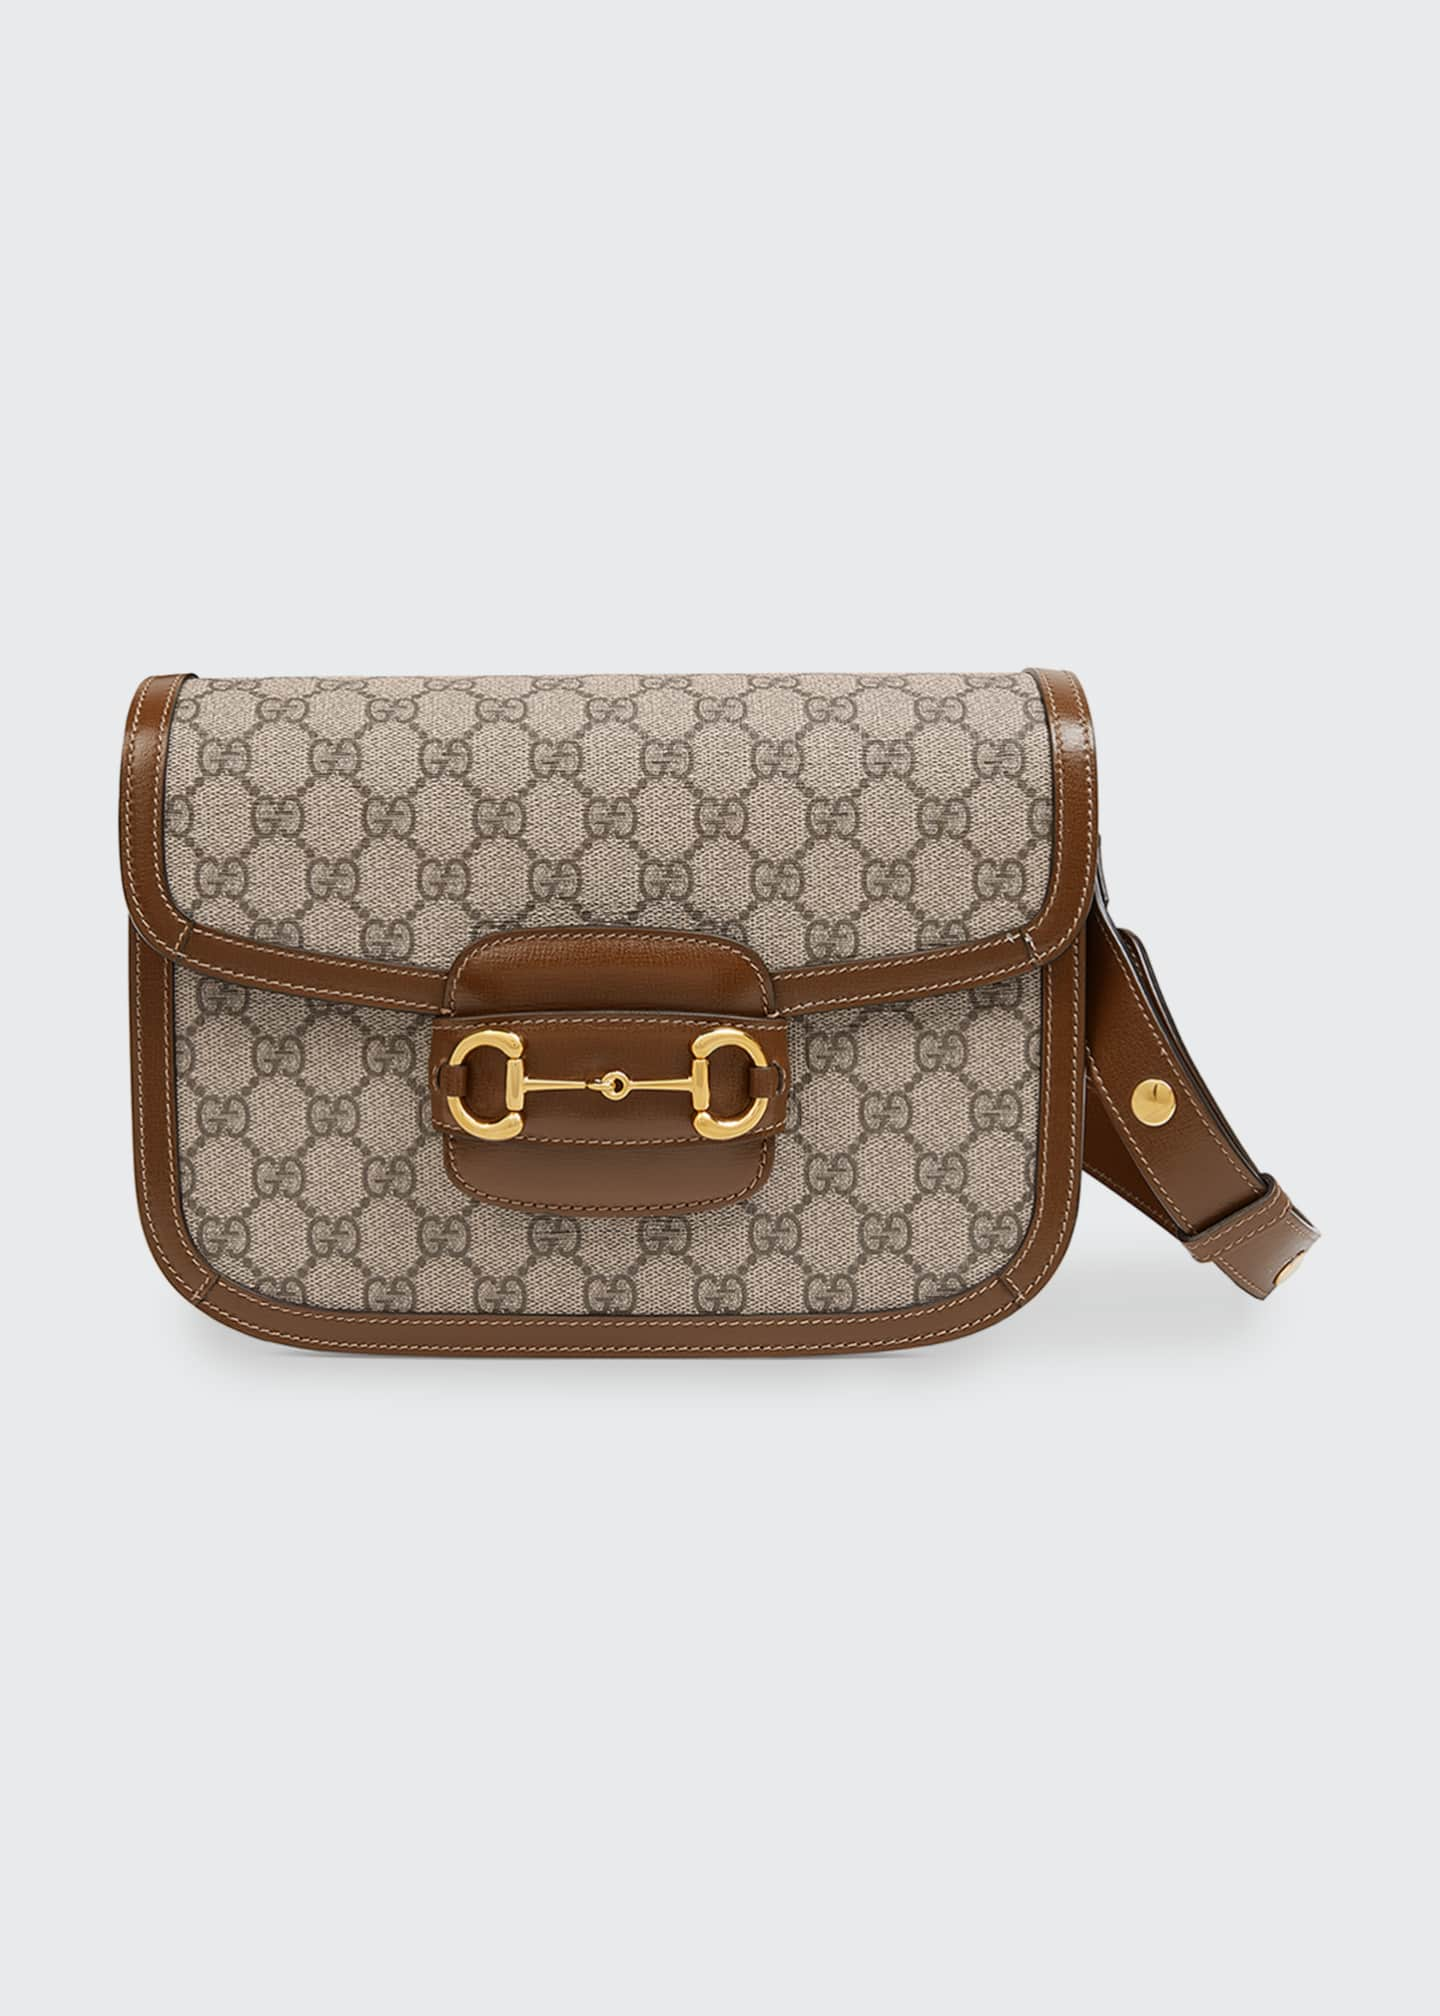 Gucci 1955 Morsetto GG Supreme Horsebit Shoulder Bag